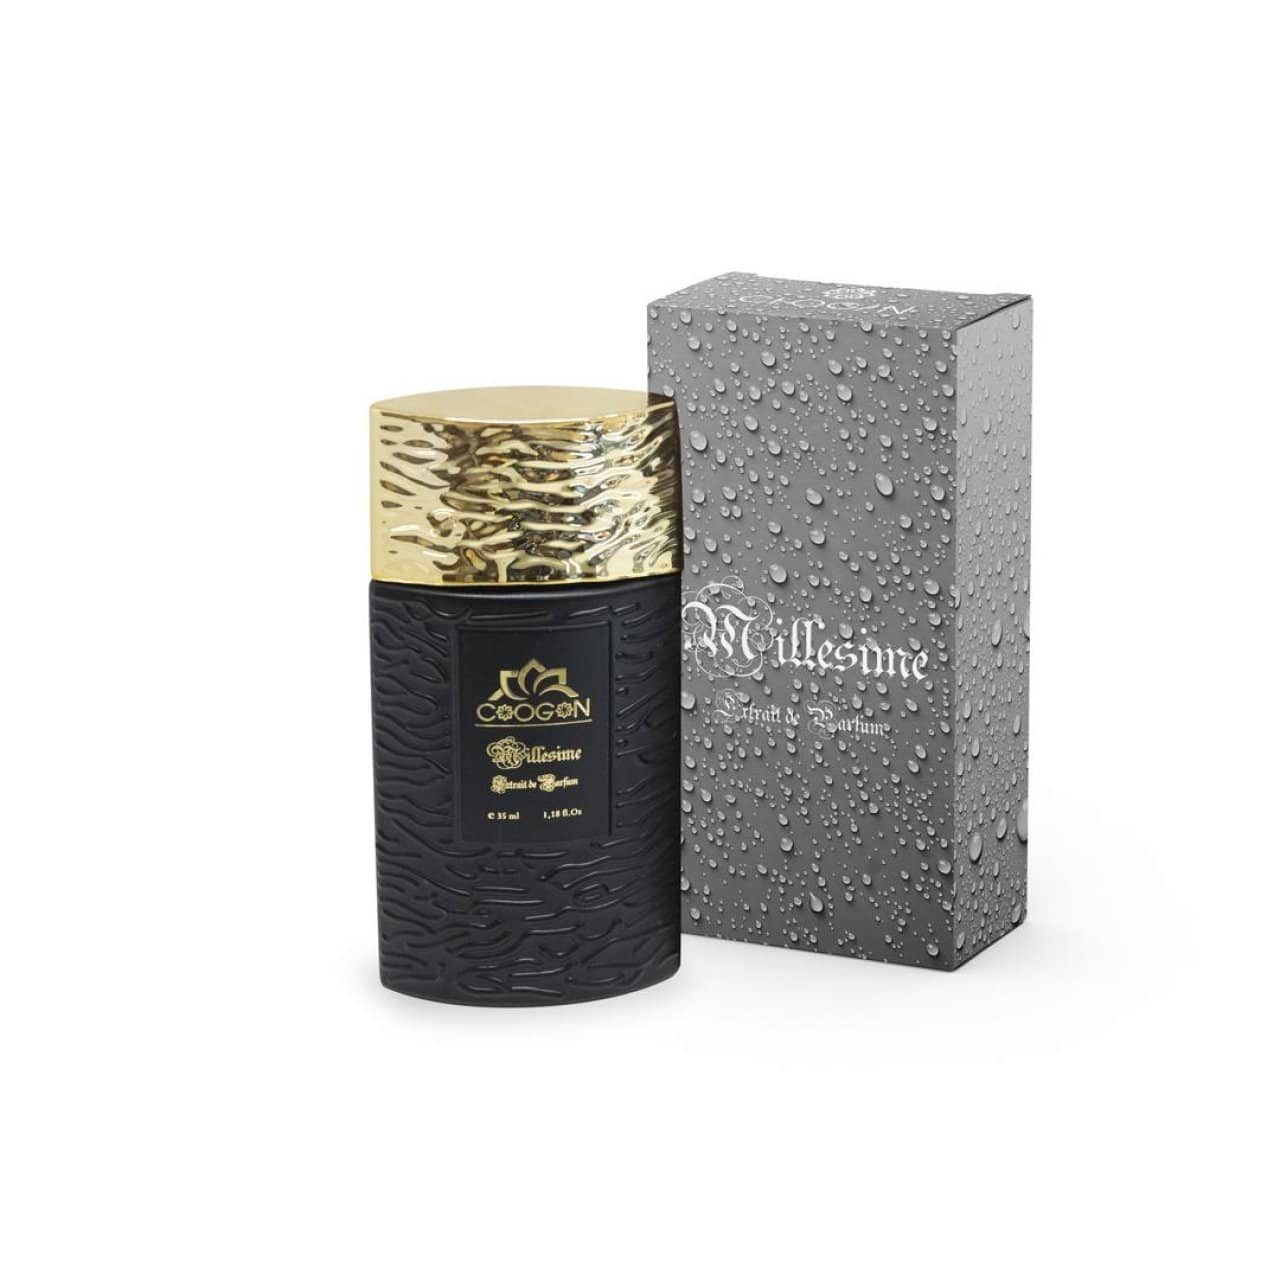 Parfum unisexe réf 073-35ml